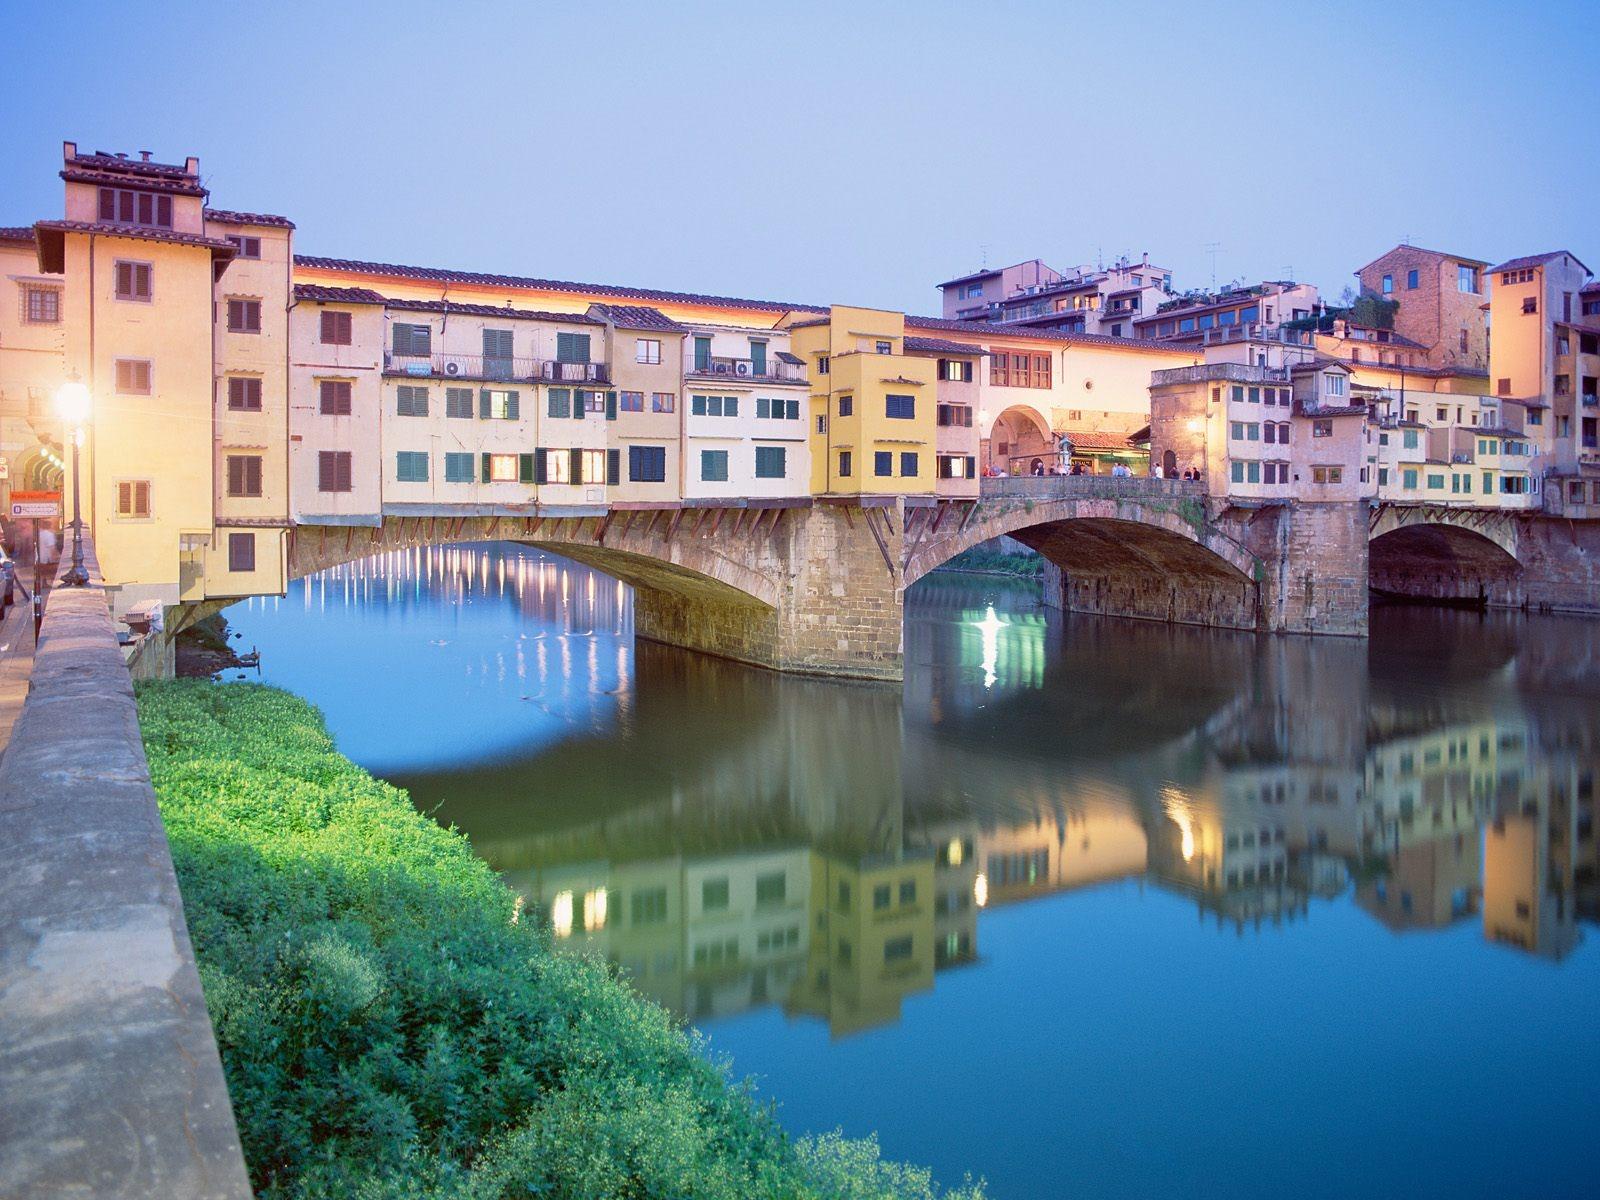 1-ponte_vecchio_florence_462468